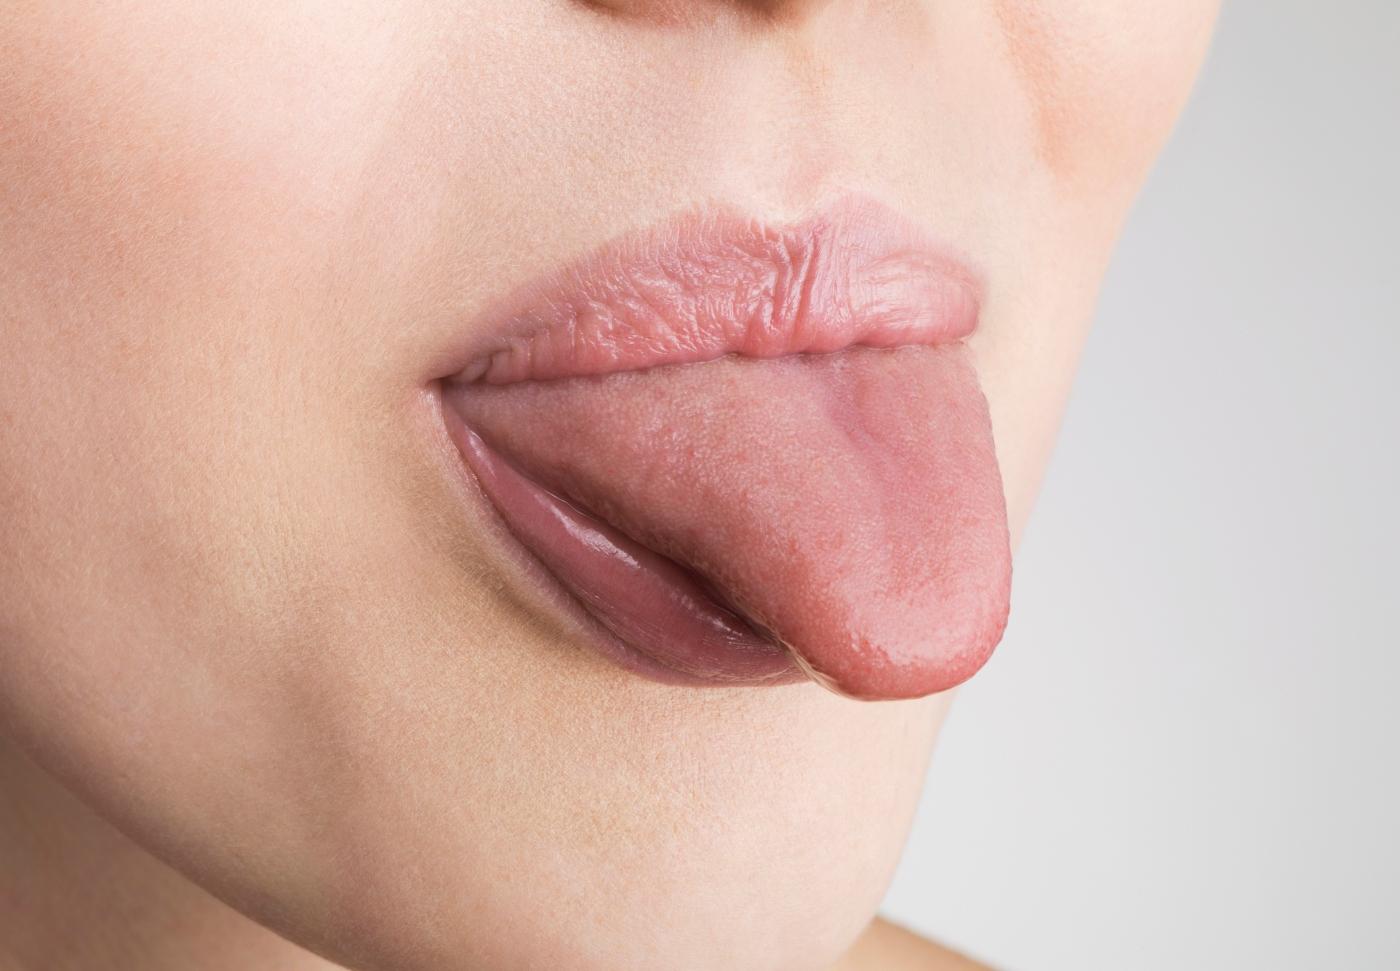 lengua mujer salud manchas